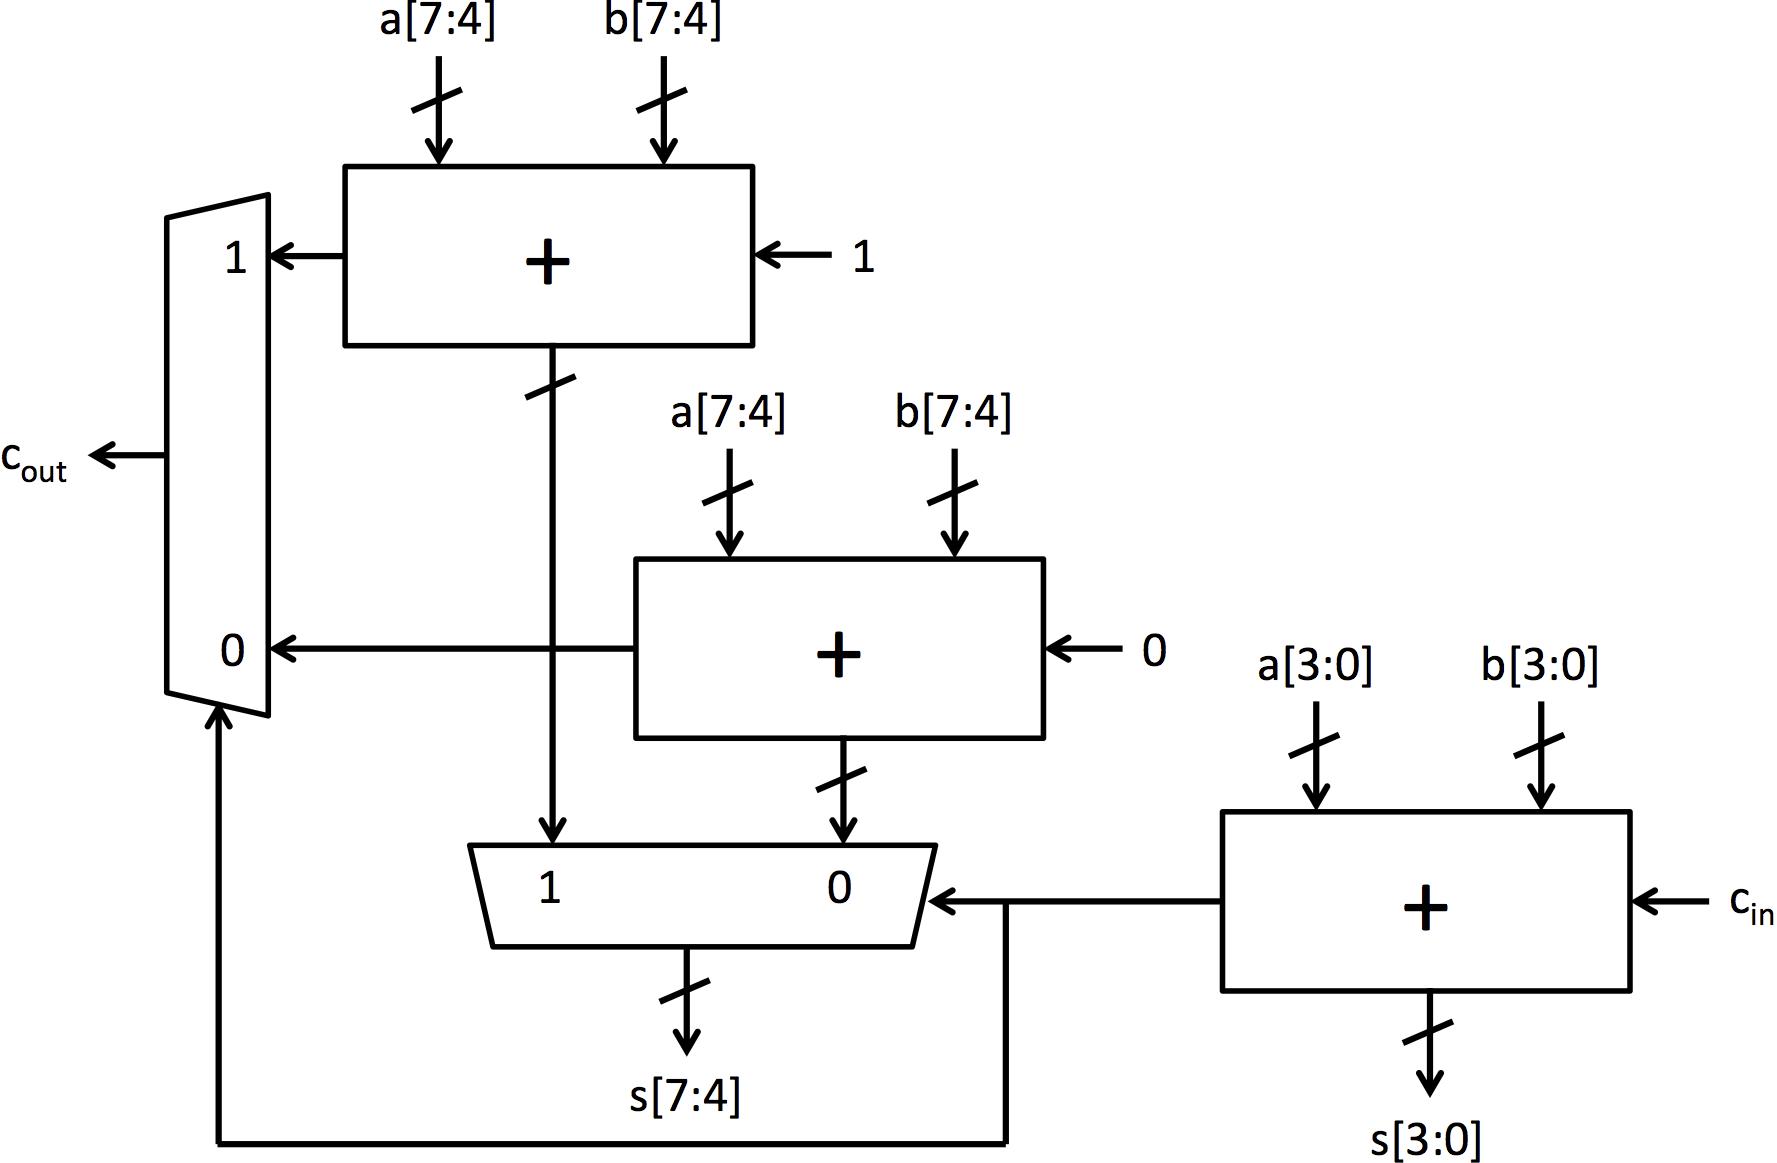 8 Bit Mux 4 1 Multiplexer Logic Diagram Wiring Library